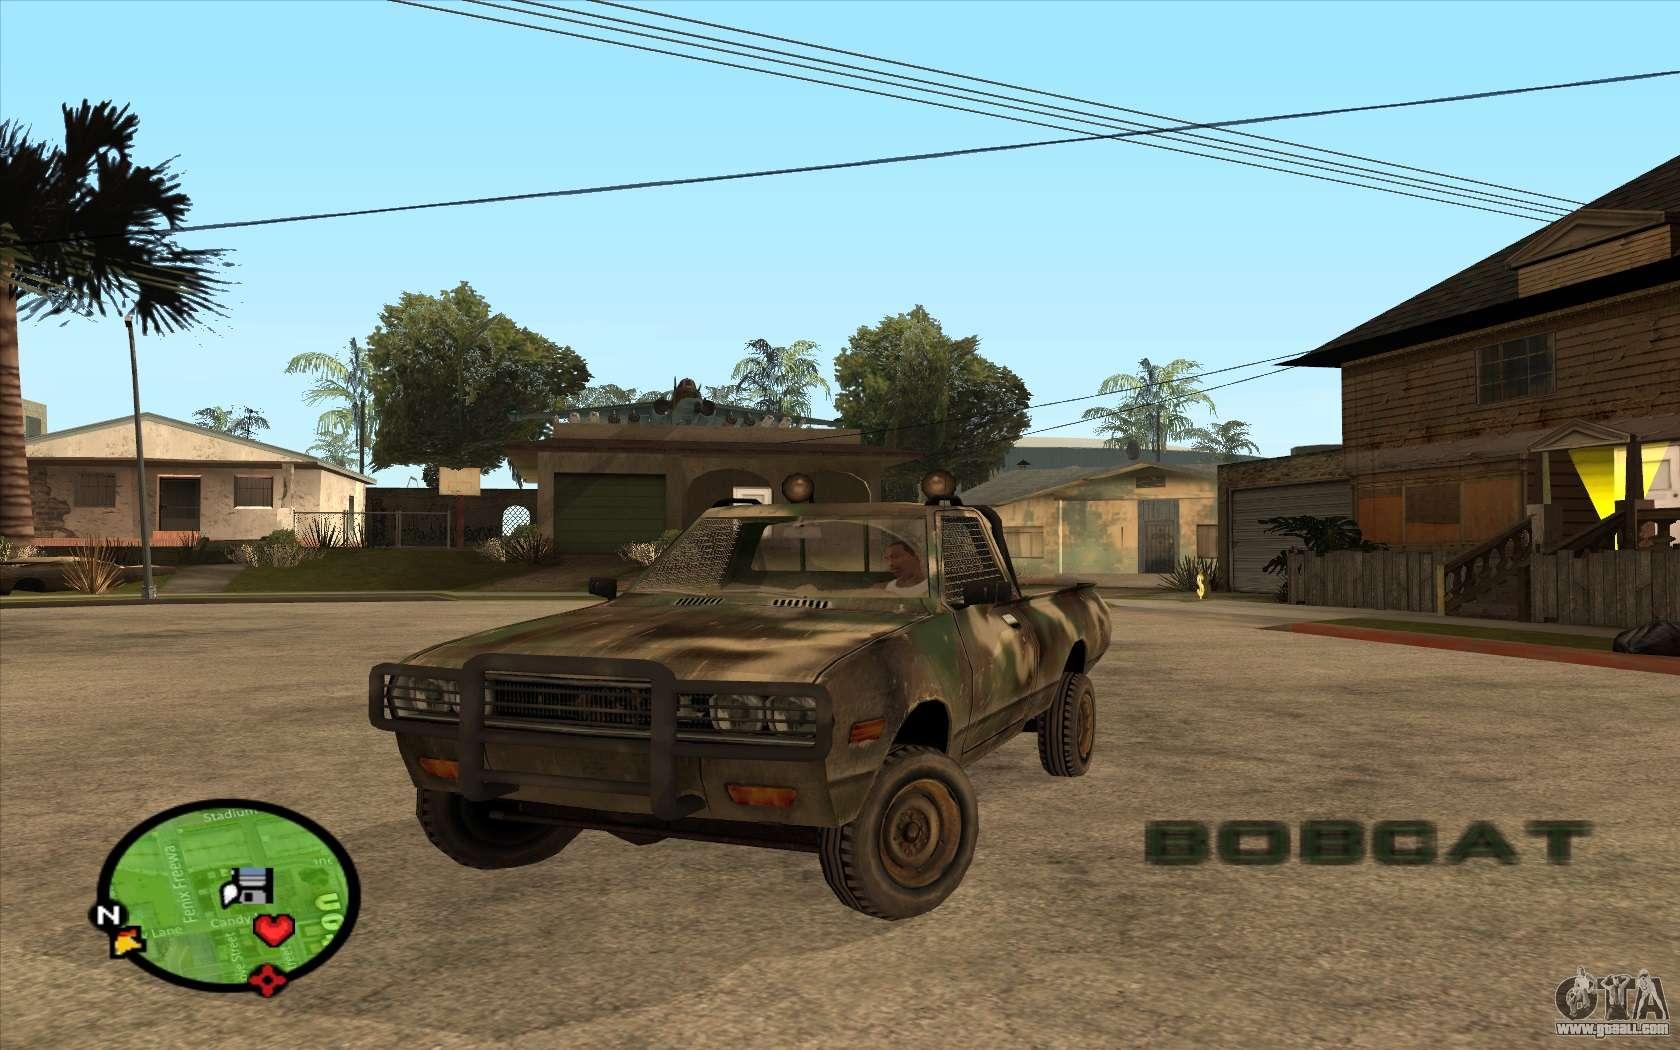 DATSUN 620 for GTA San Andreas